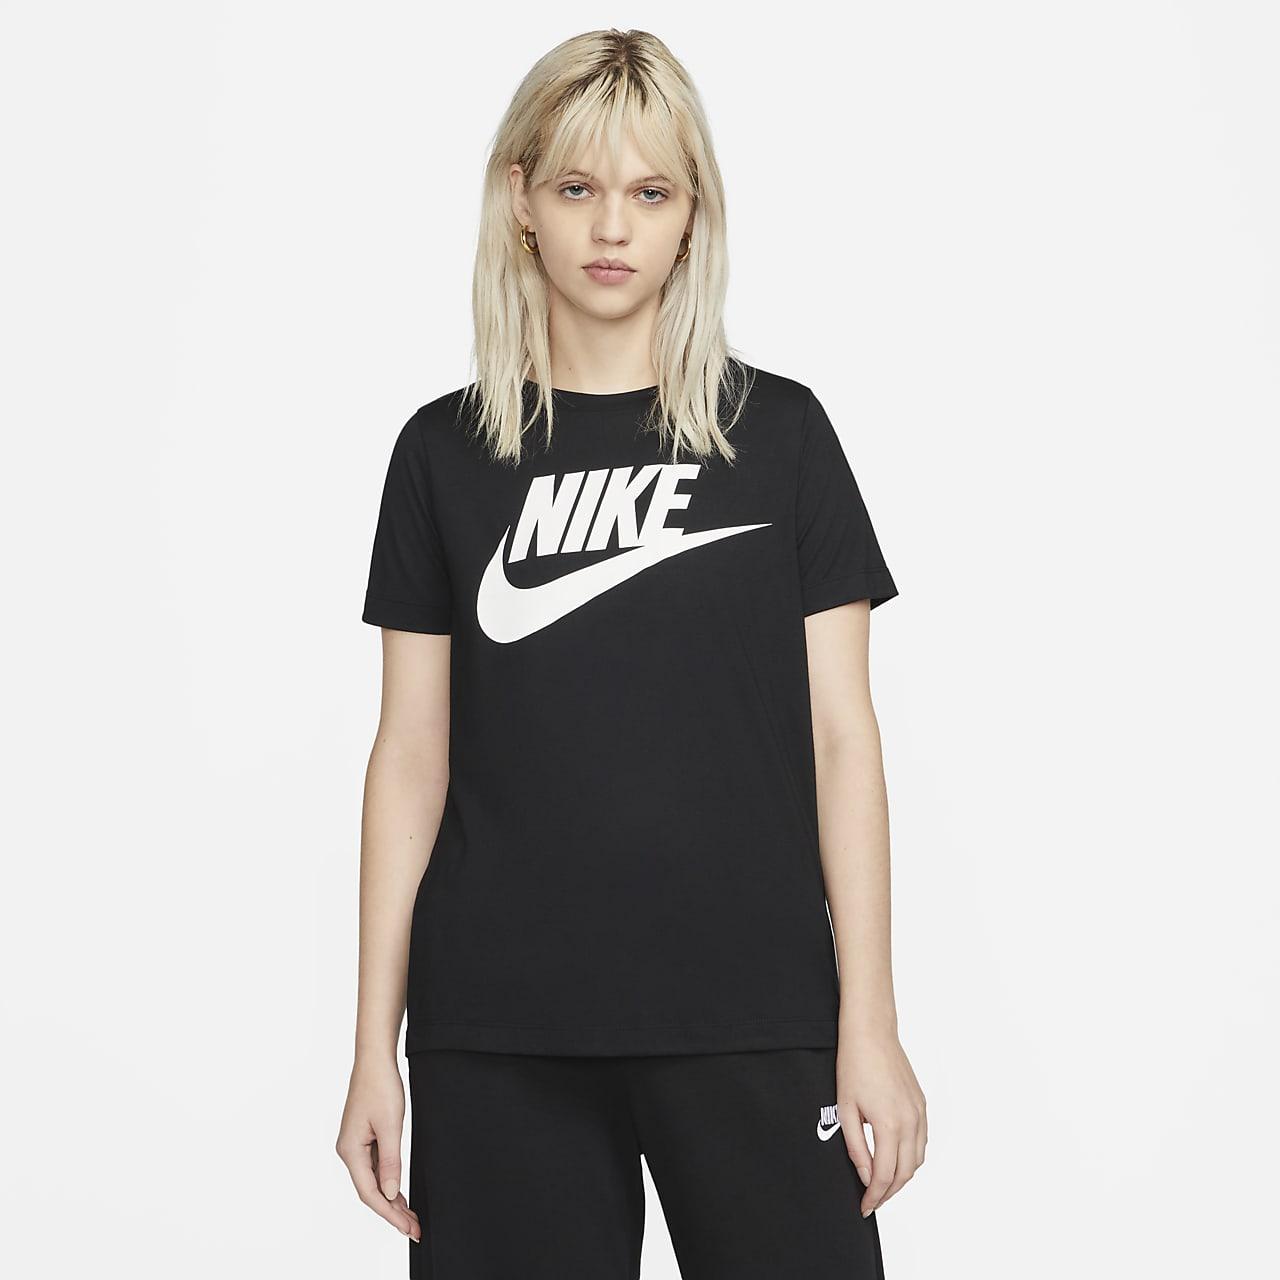 bf186531cca1 Γυναικεία κοντομάνικη μπλούζα με λογότυπο Nike Sportswear Essential ...